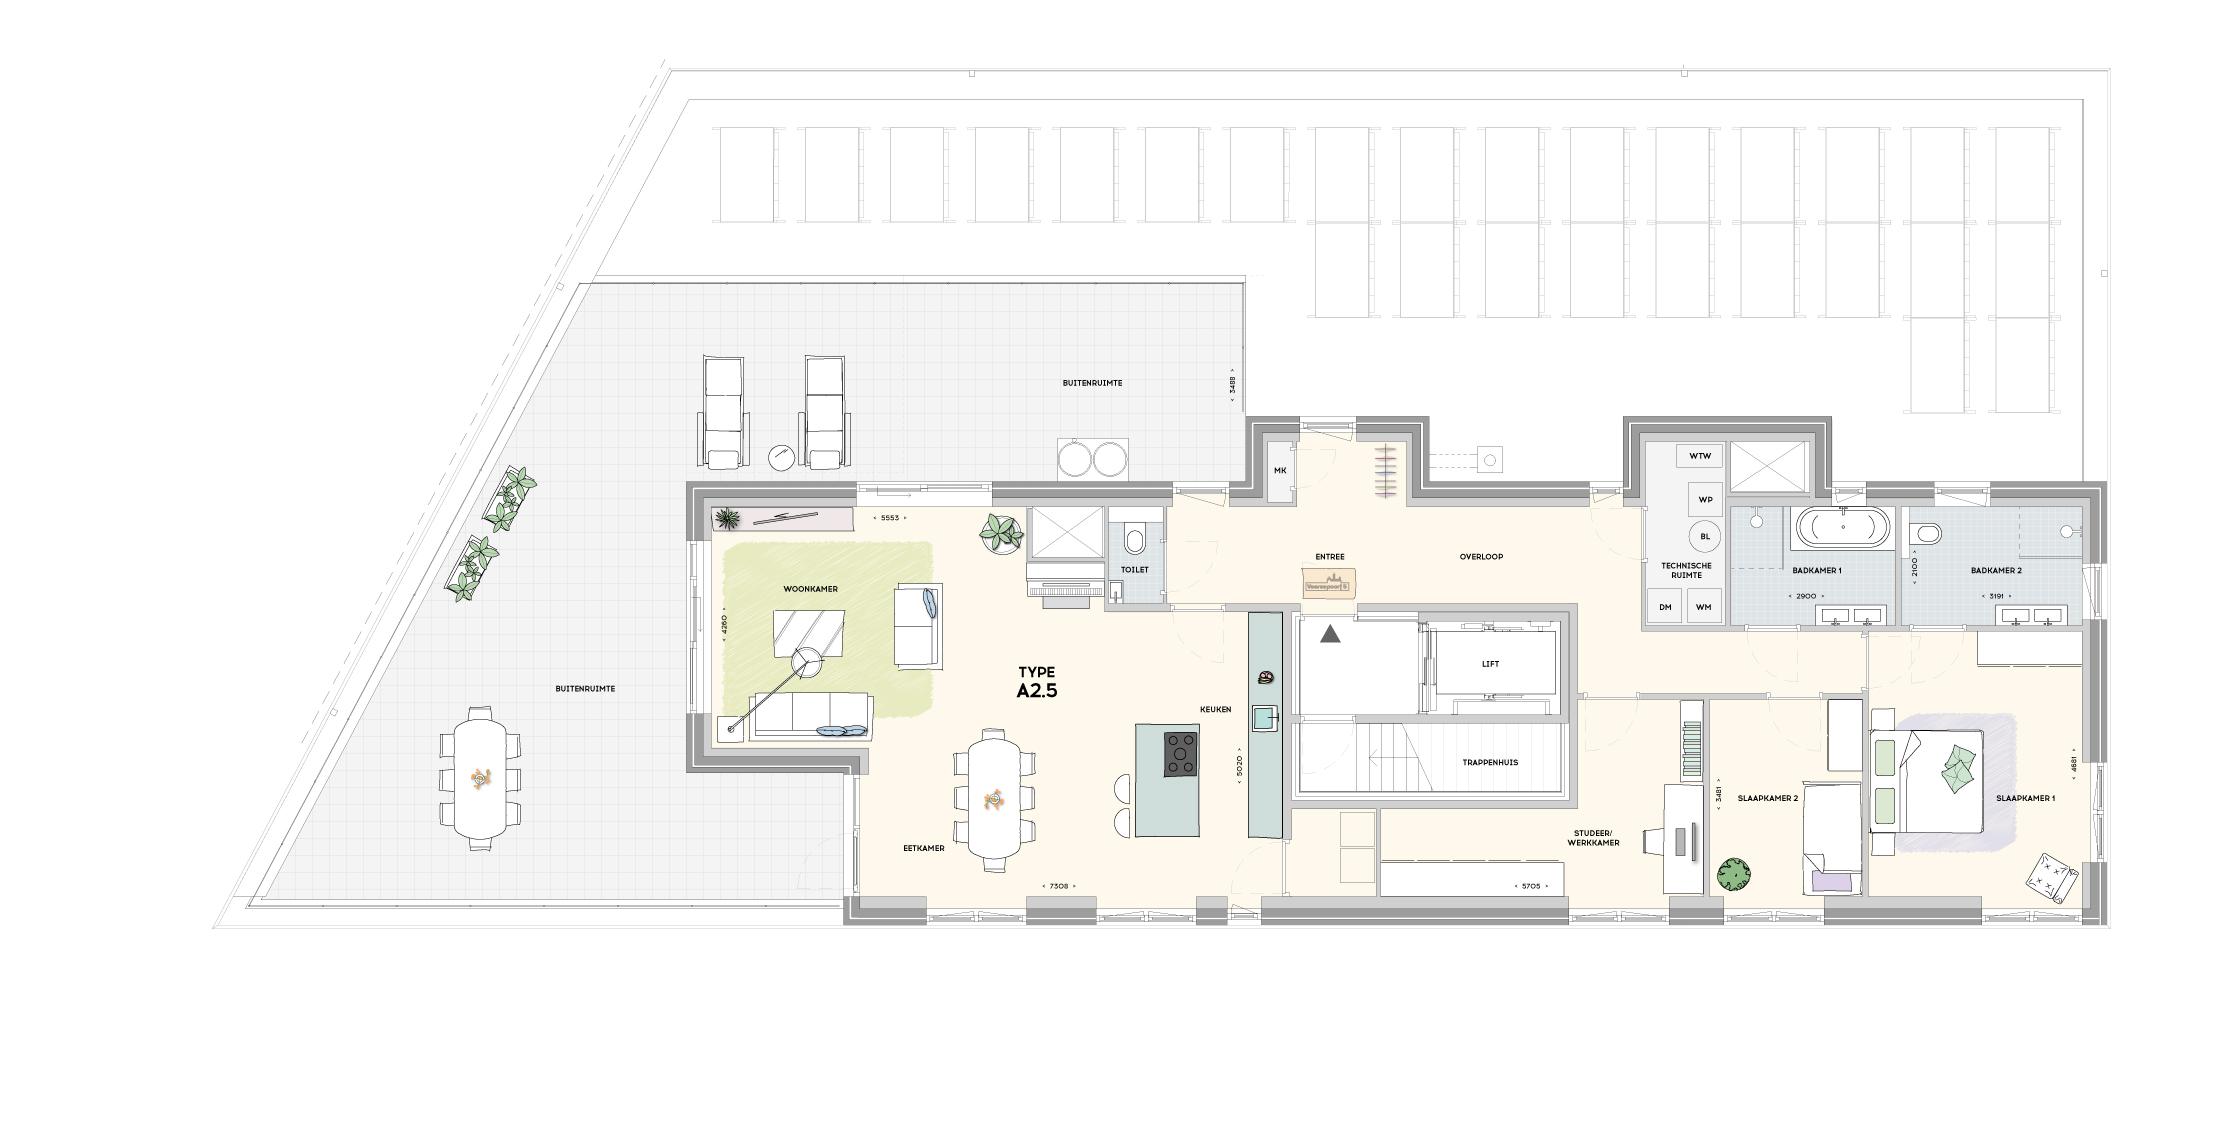 Gebouw 2 penthouse